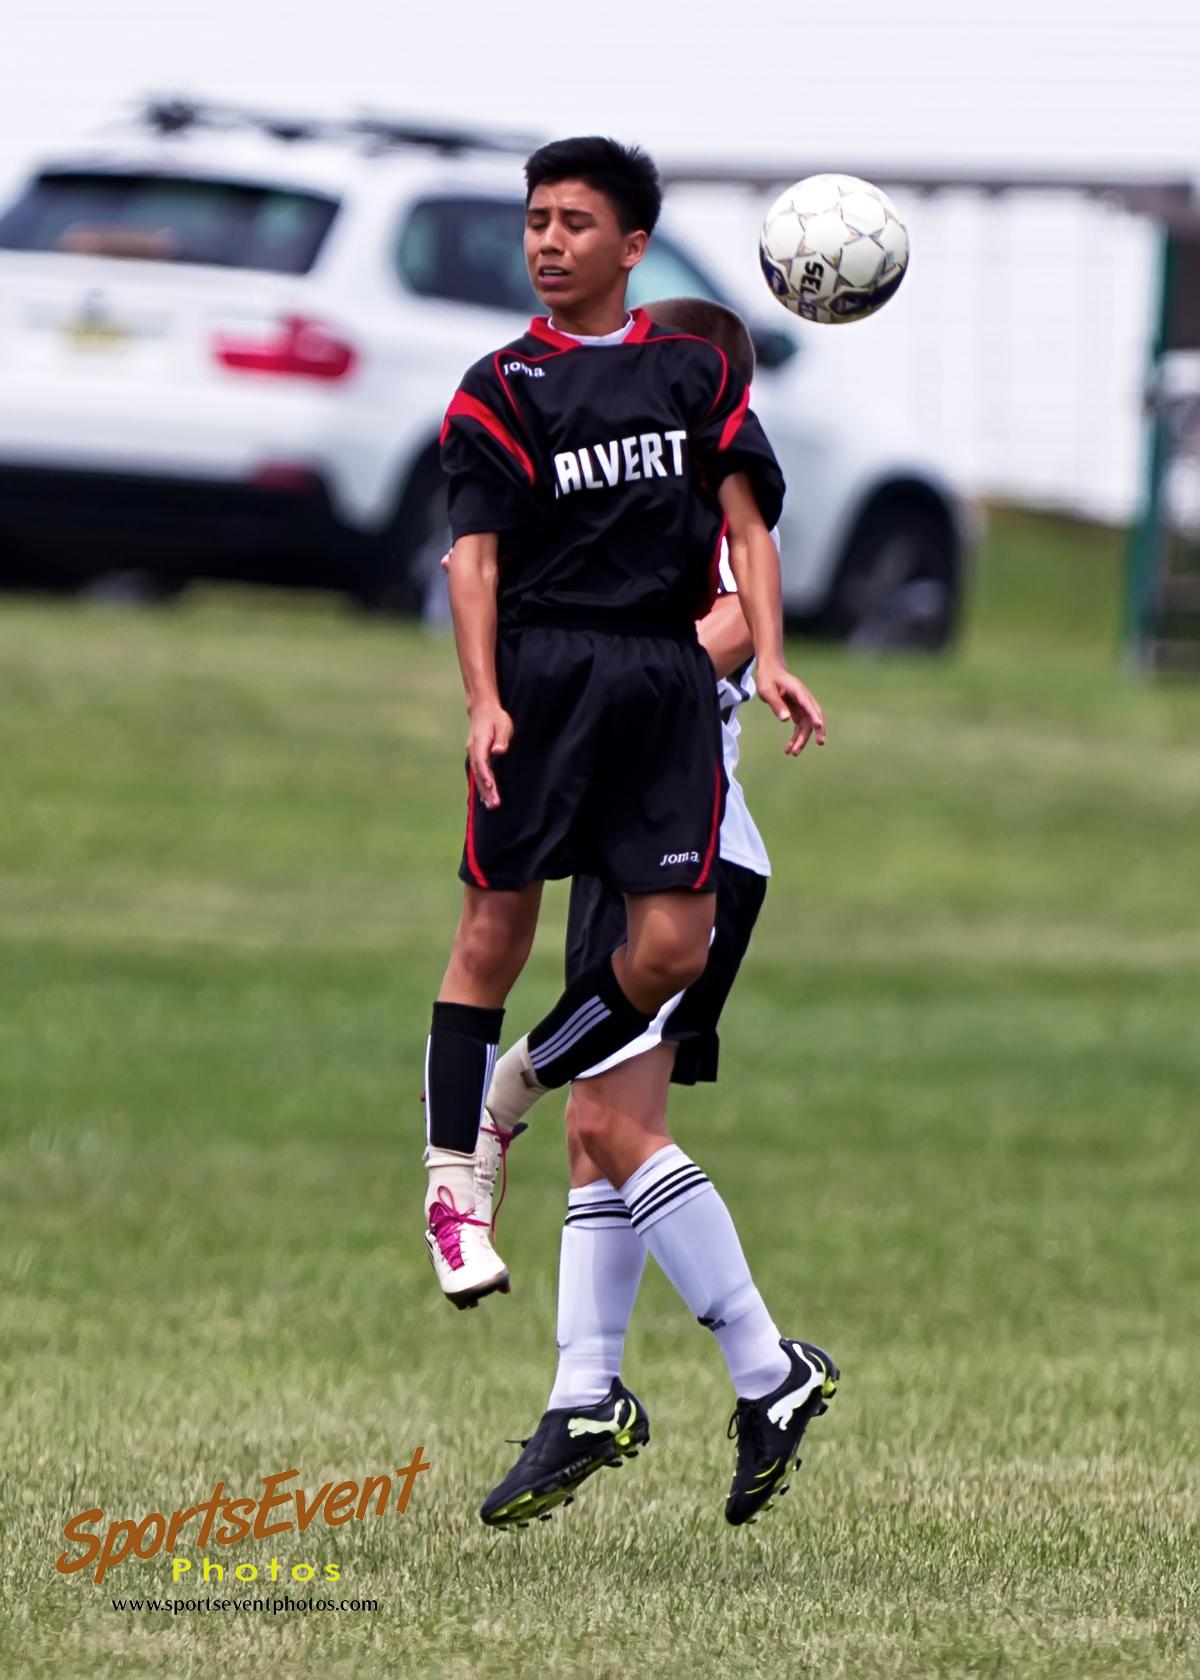 sportseventphotos-soccer-14